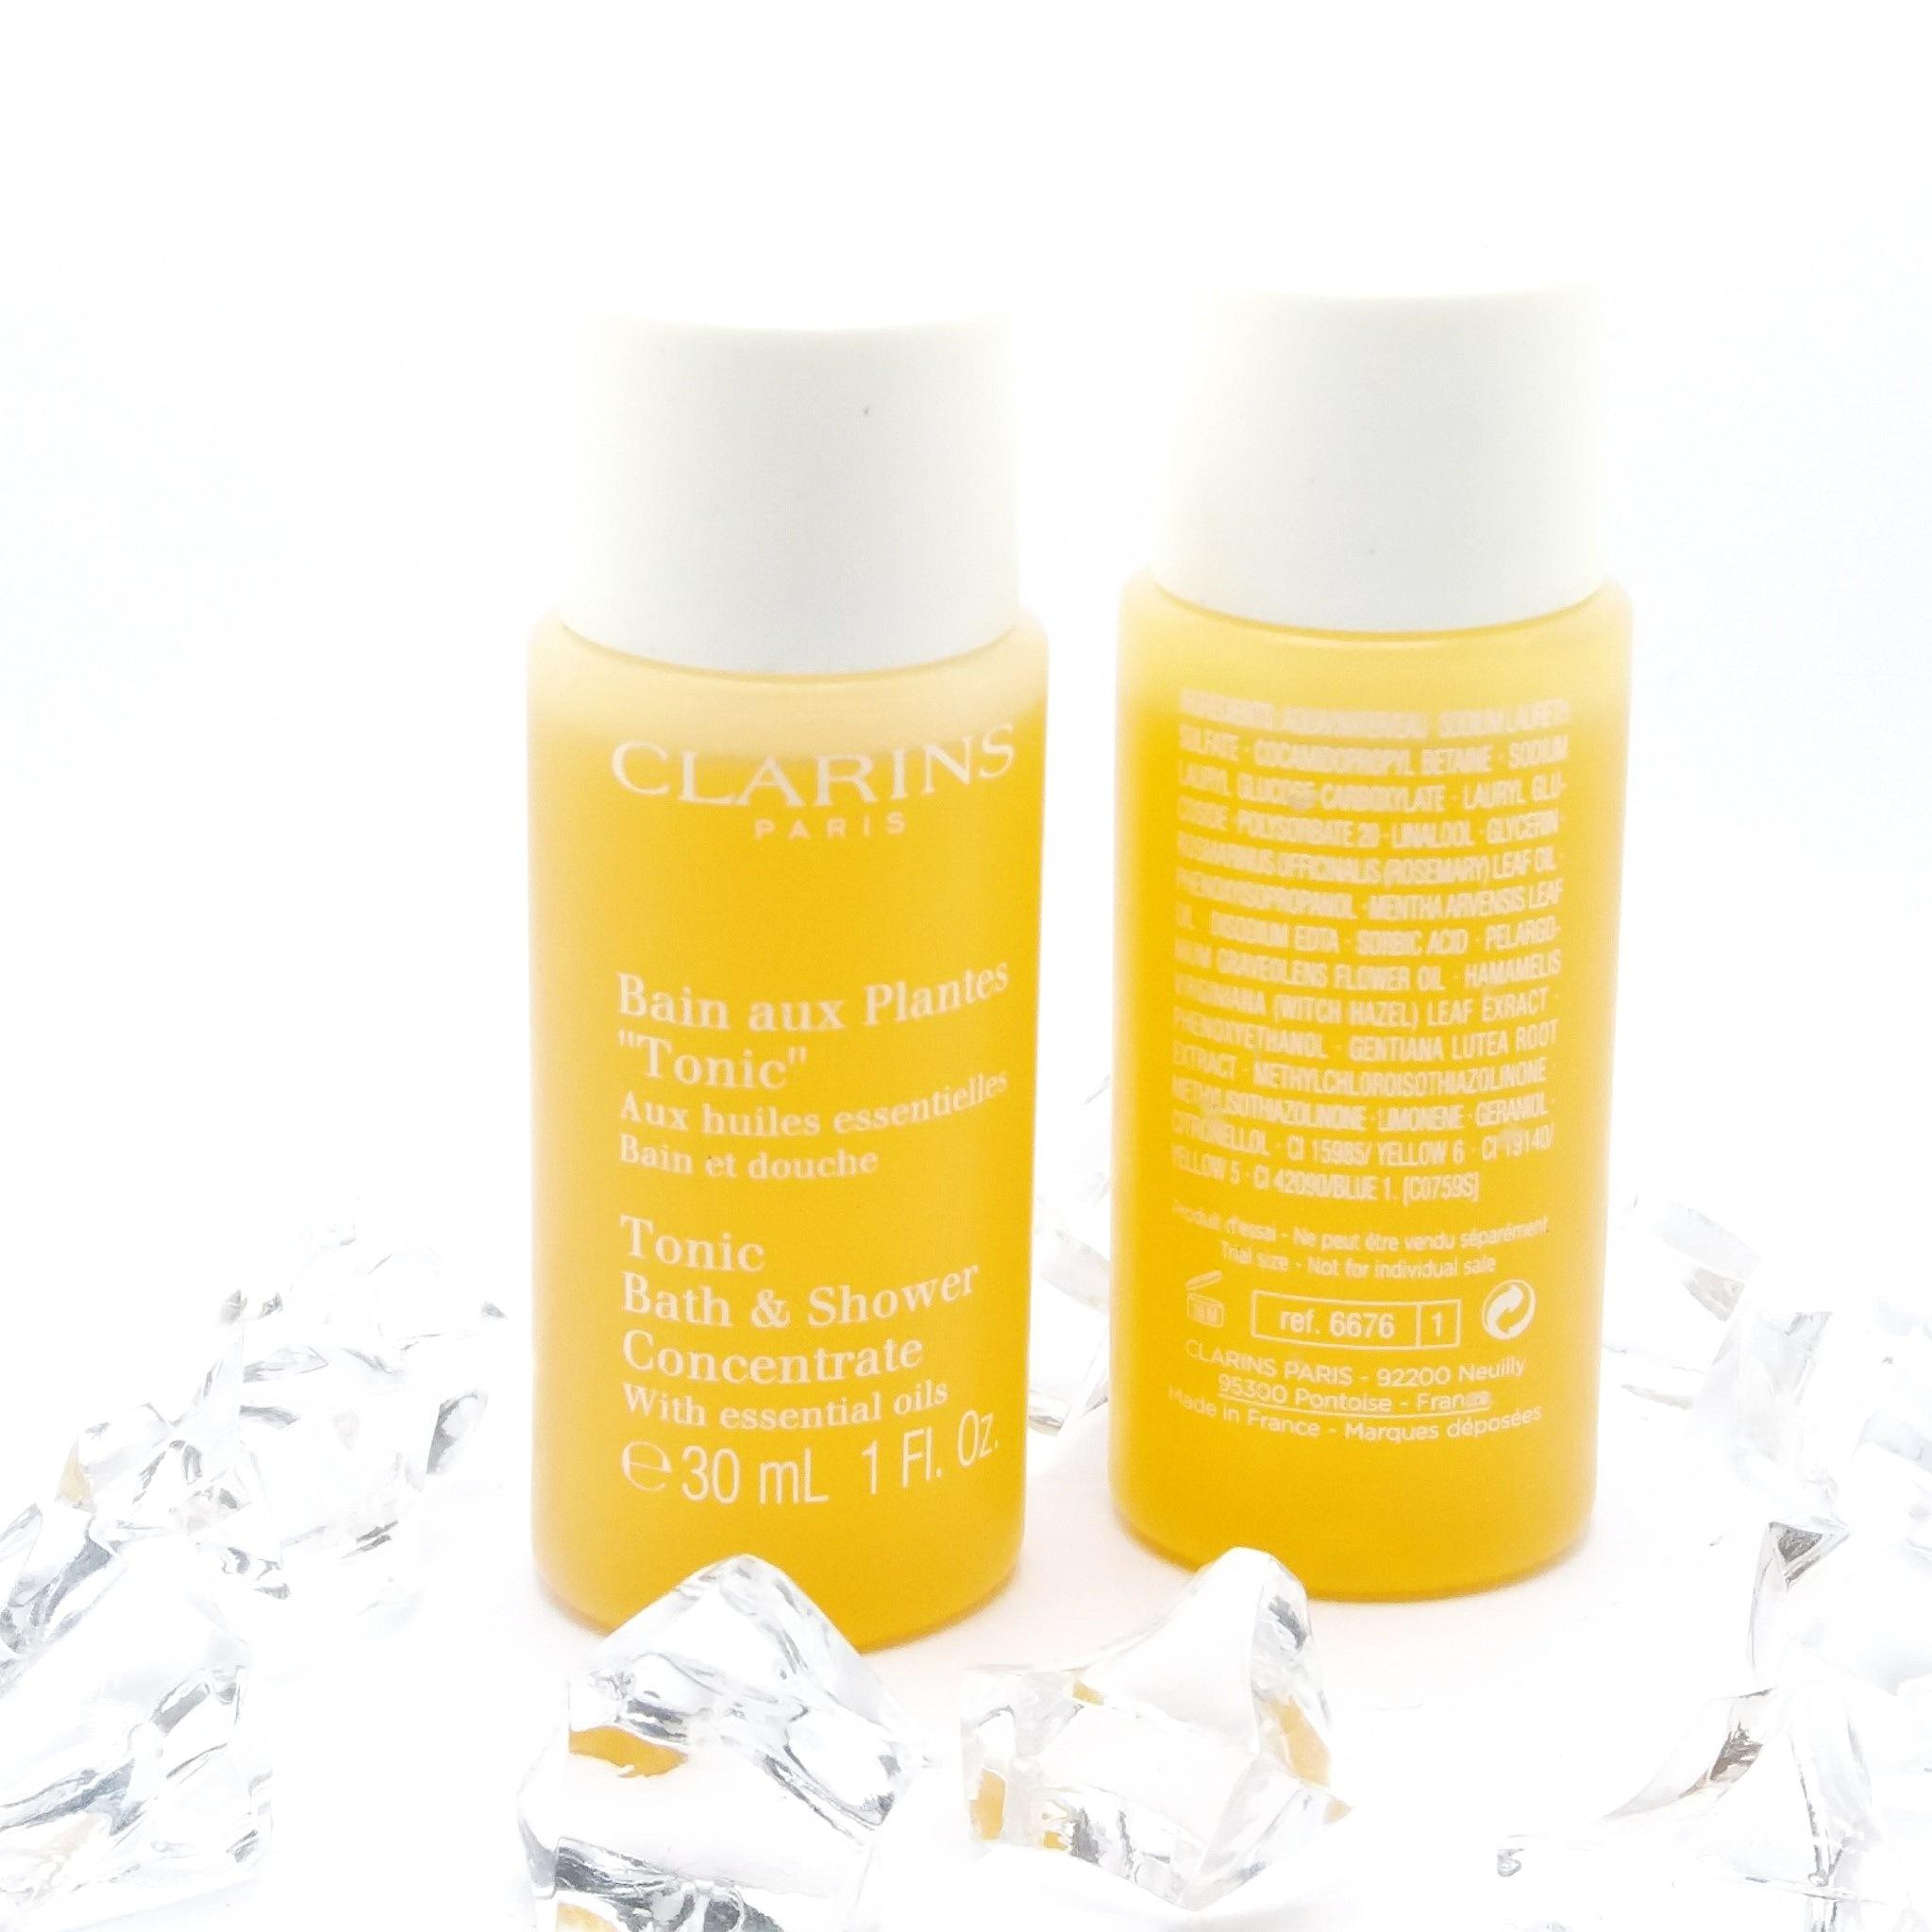 Clarins Tonic Bath & Shower Concentrate 30 ml. เจลอาบน้ำ ช่วยกระชับผิวให้เรียบเนียน ลดการบวมน้ำในผิว เติมความชุ่มชื่น ให้ผิวเนียนนุ่ม เปล่งปลั่ง อณูฟองละเอียดเข้าชะล้าง สิ่งสกปรกได้สะอาดหมดจด ด้วยสารสกัดจาก Gentian และ Pine พร้อมมอบความรู้สึกผ่อนคลายขณะอา